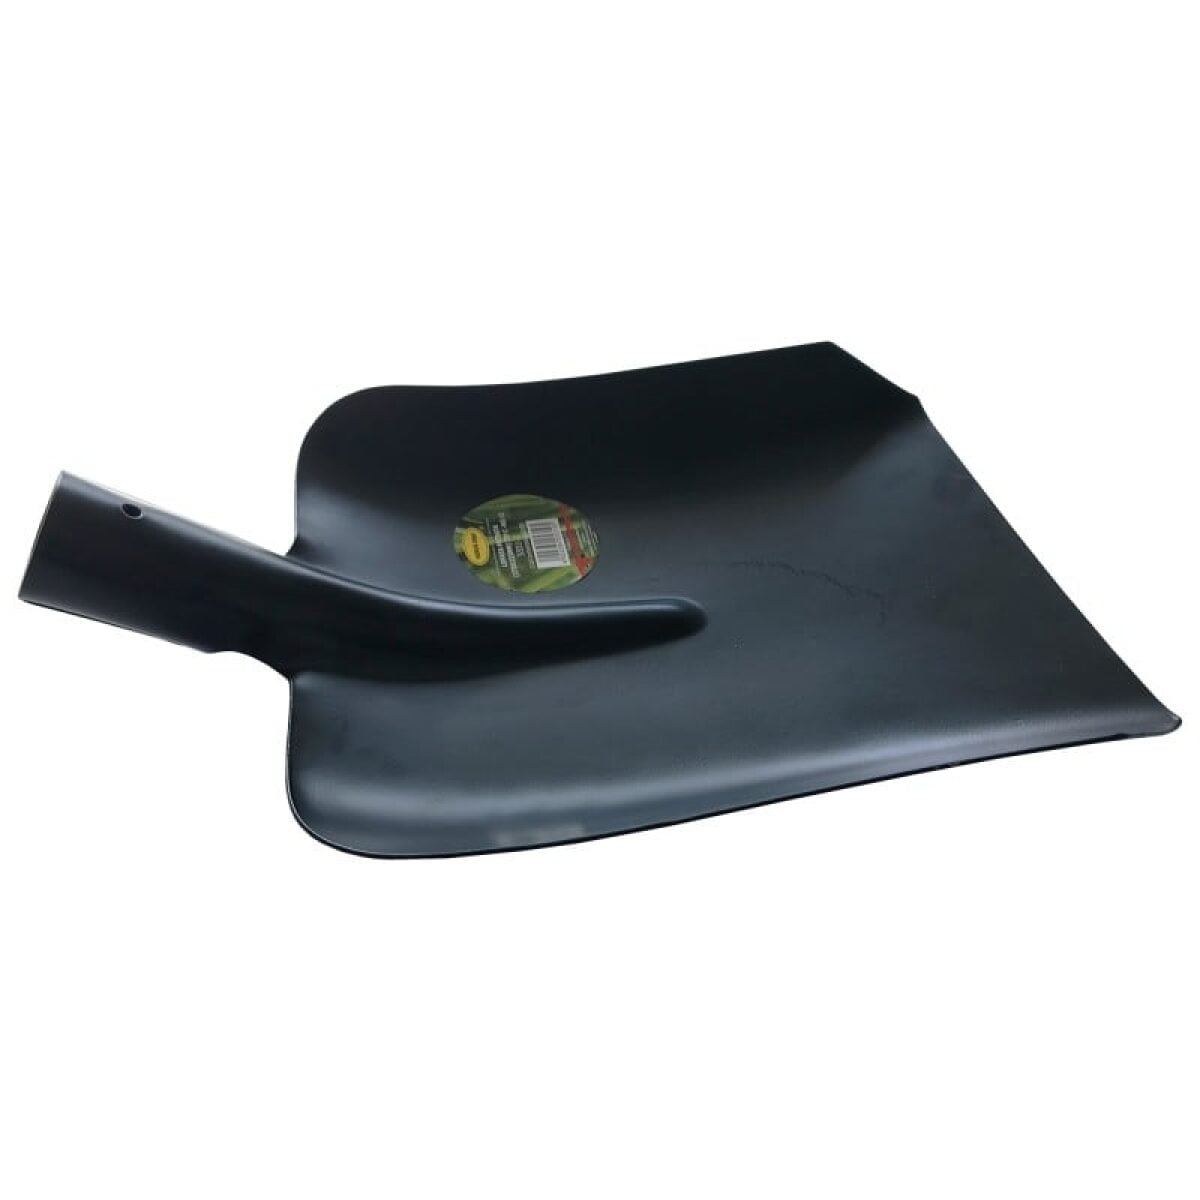 lopata patrata s551 2 270x233 mm tip c ng ii padure gardina.ro 46